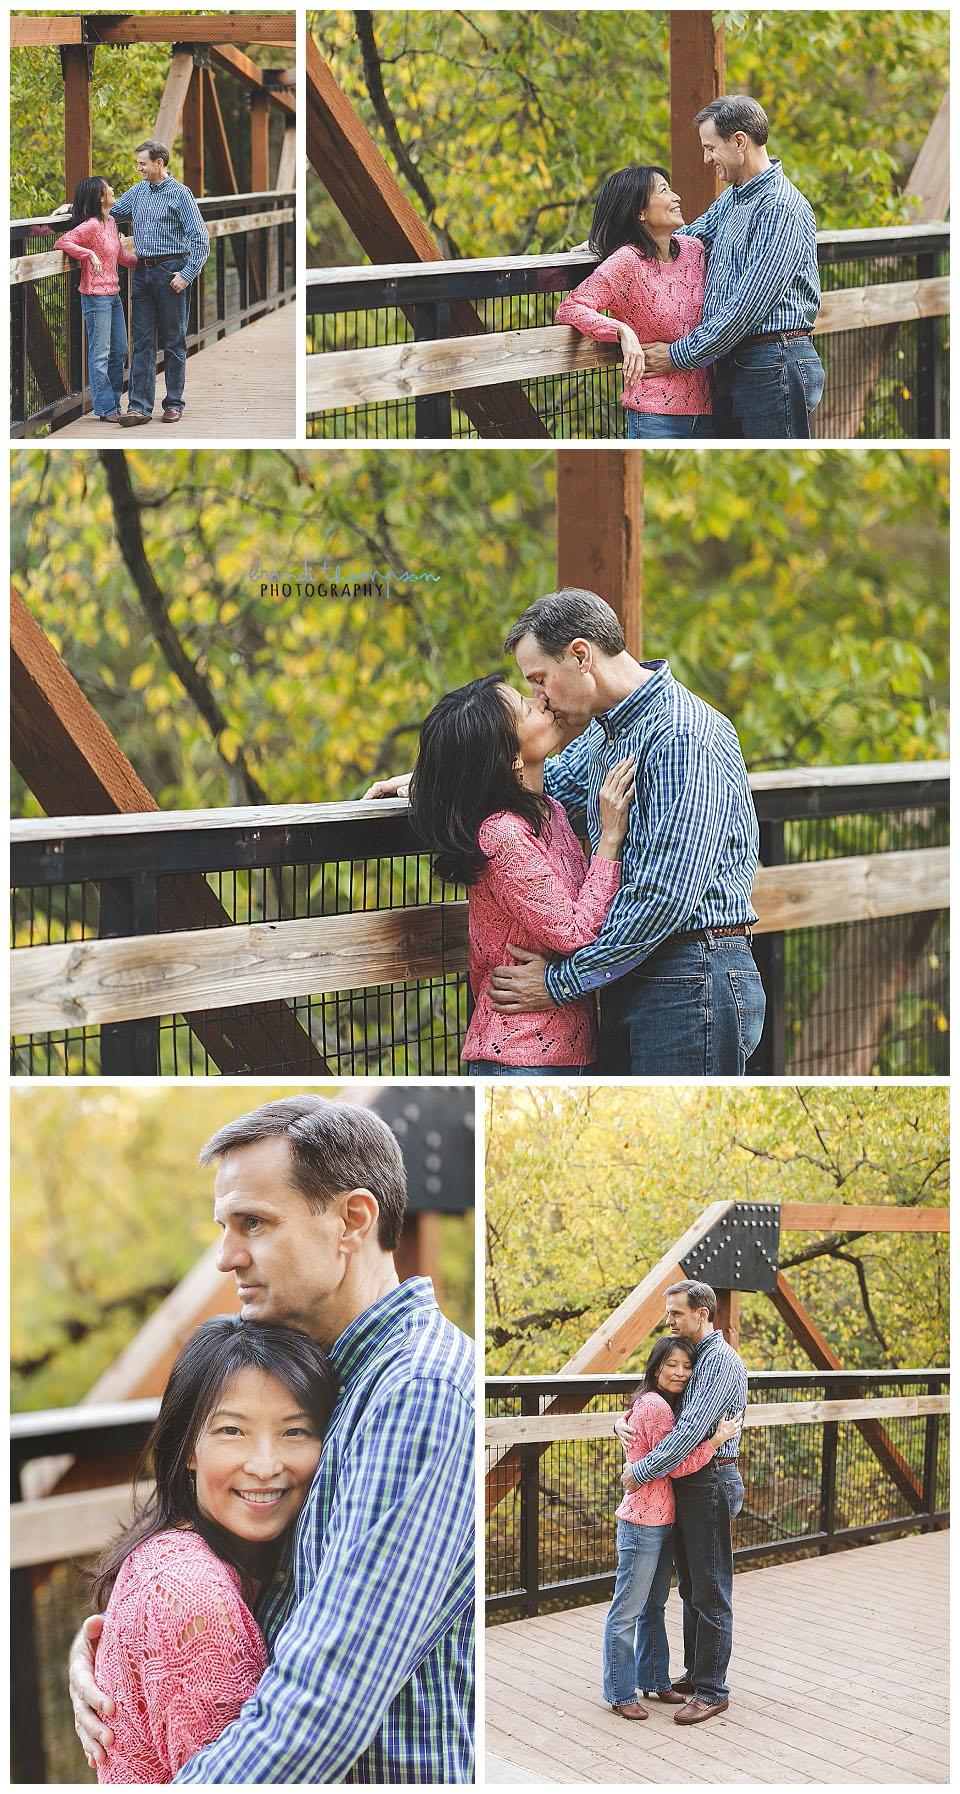 plano engagement photography, plano small wedding photographer